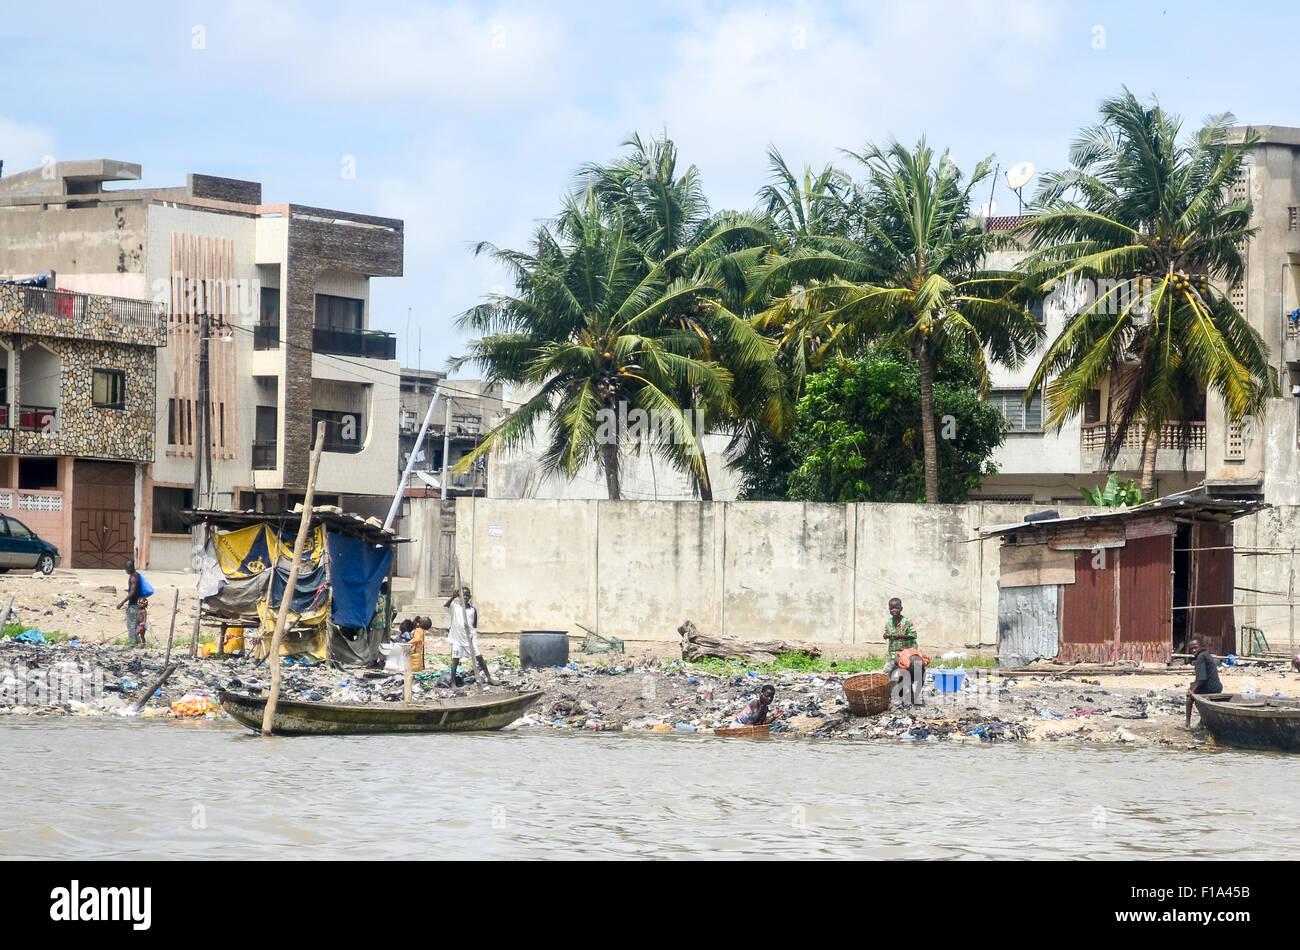 Polluted Ouémé river in Cotonou, Benin - Stock Image